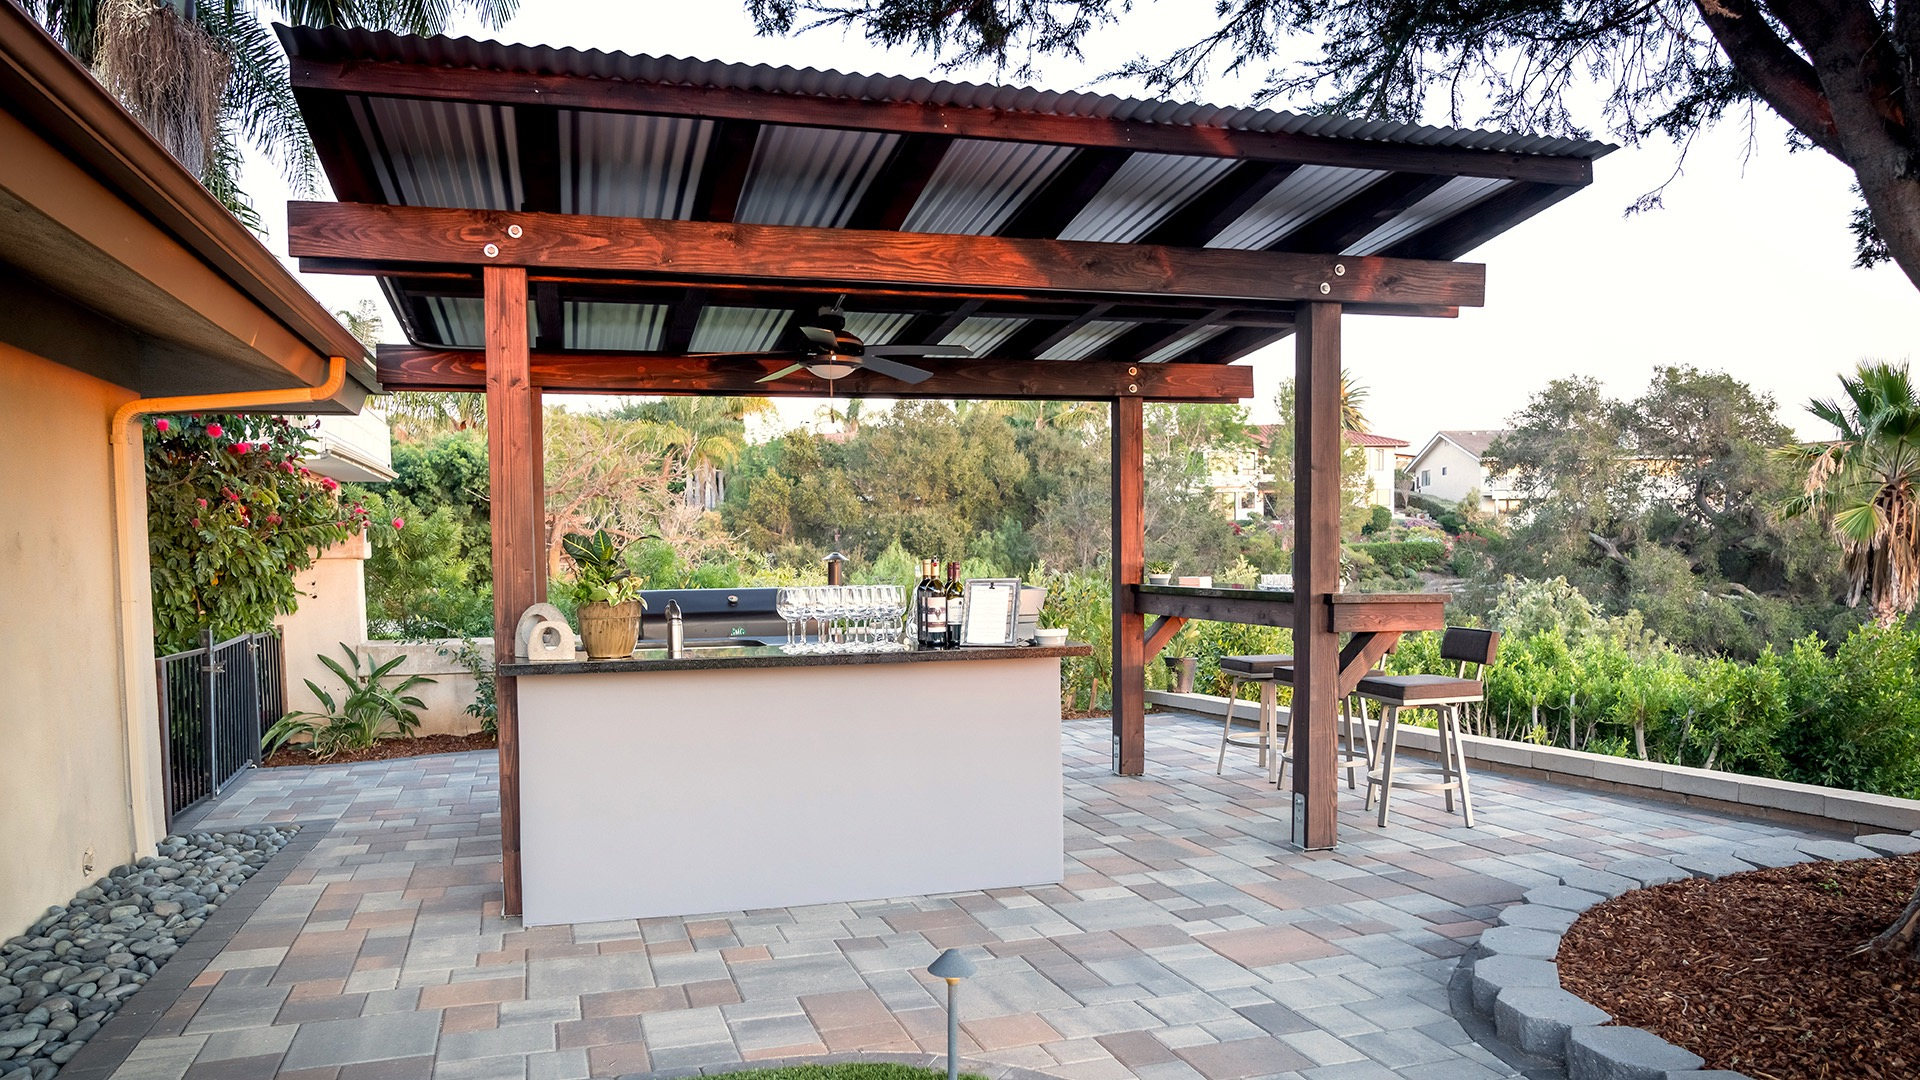 Construction services by EcoLawn Santa Barbara